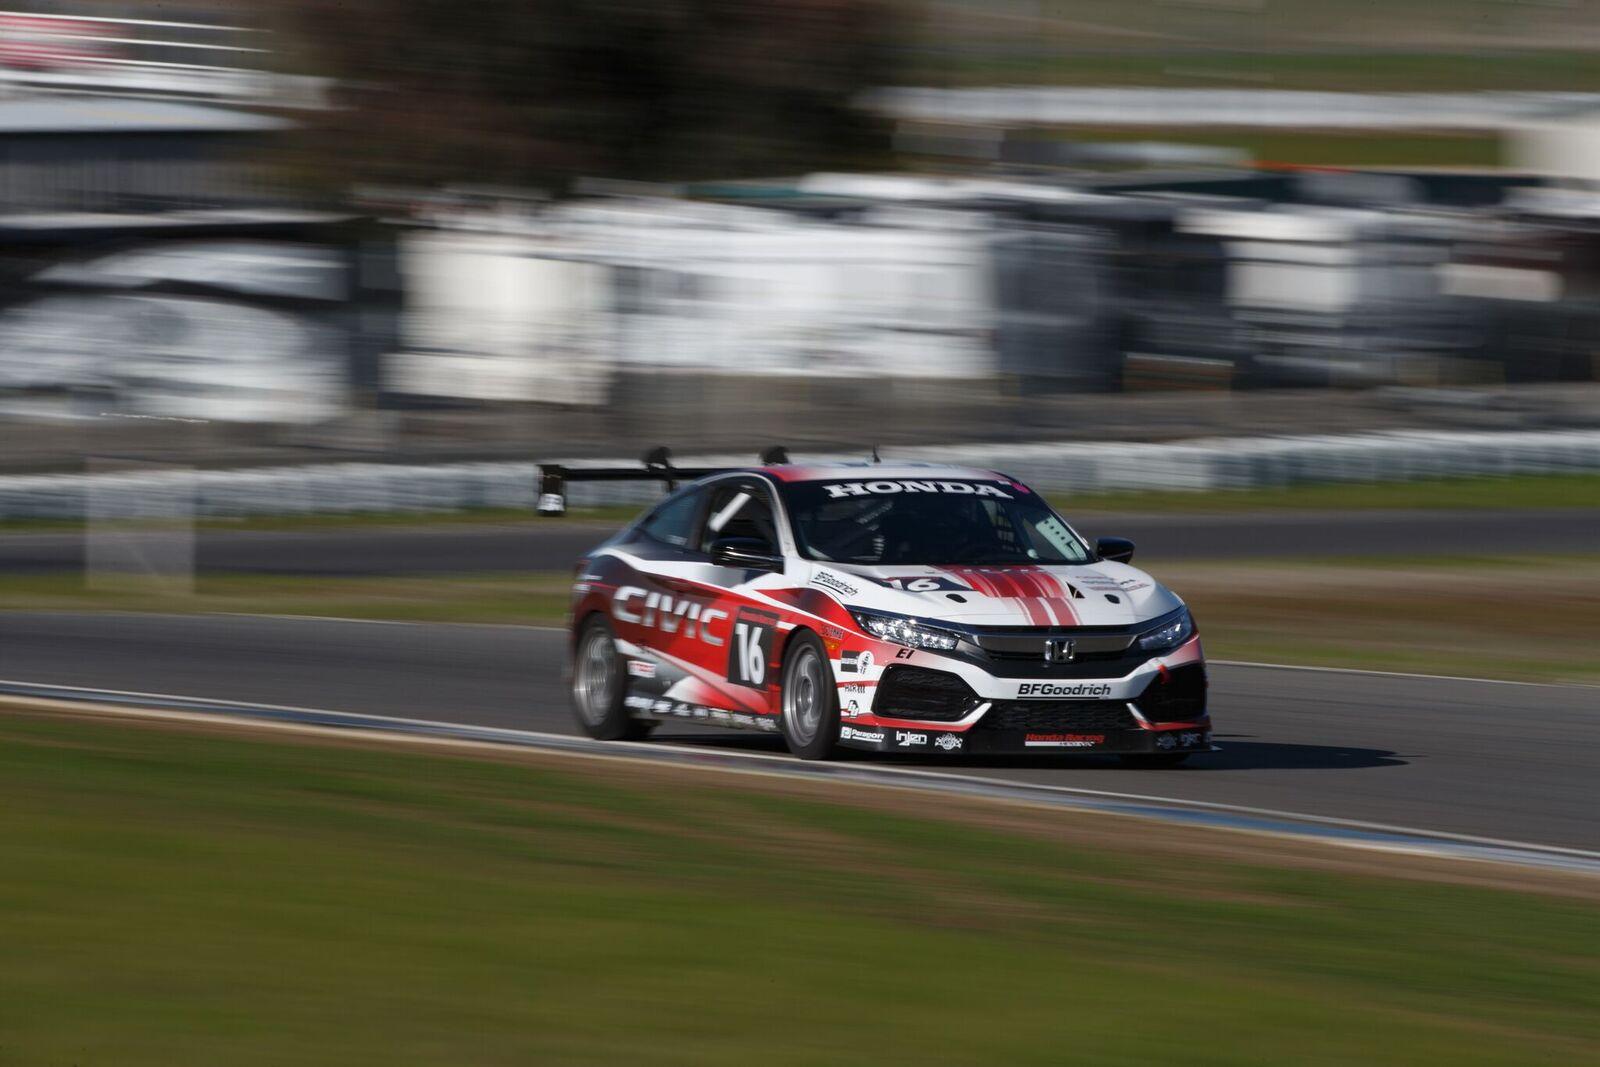 Civic race car bing images for Honda civic race car